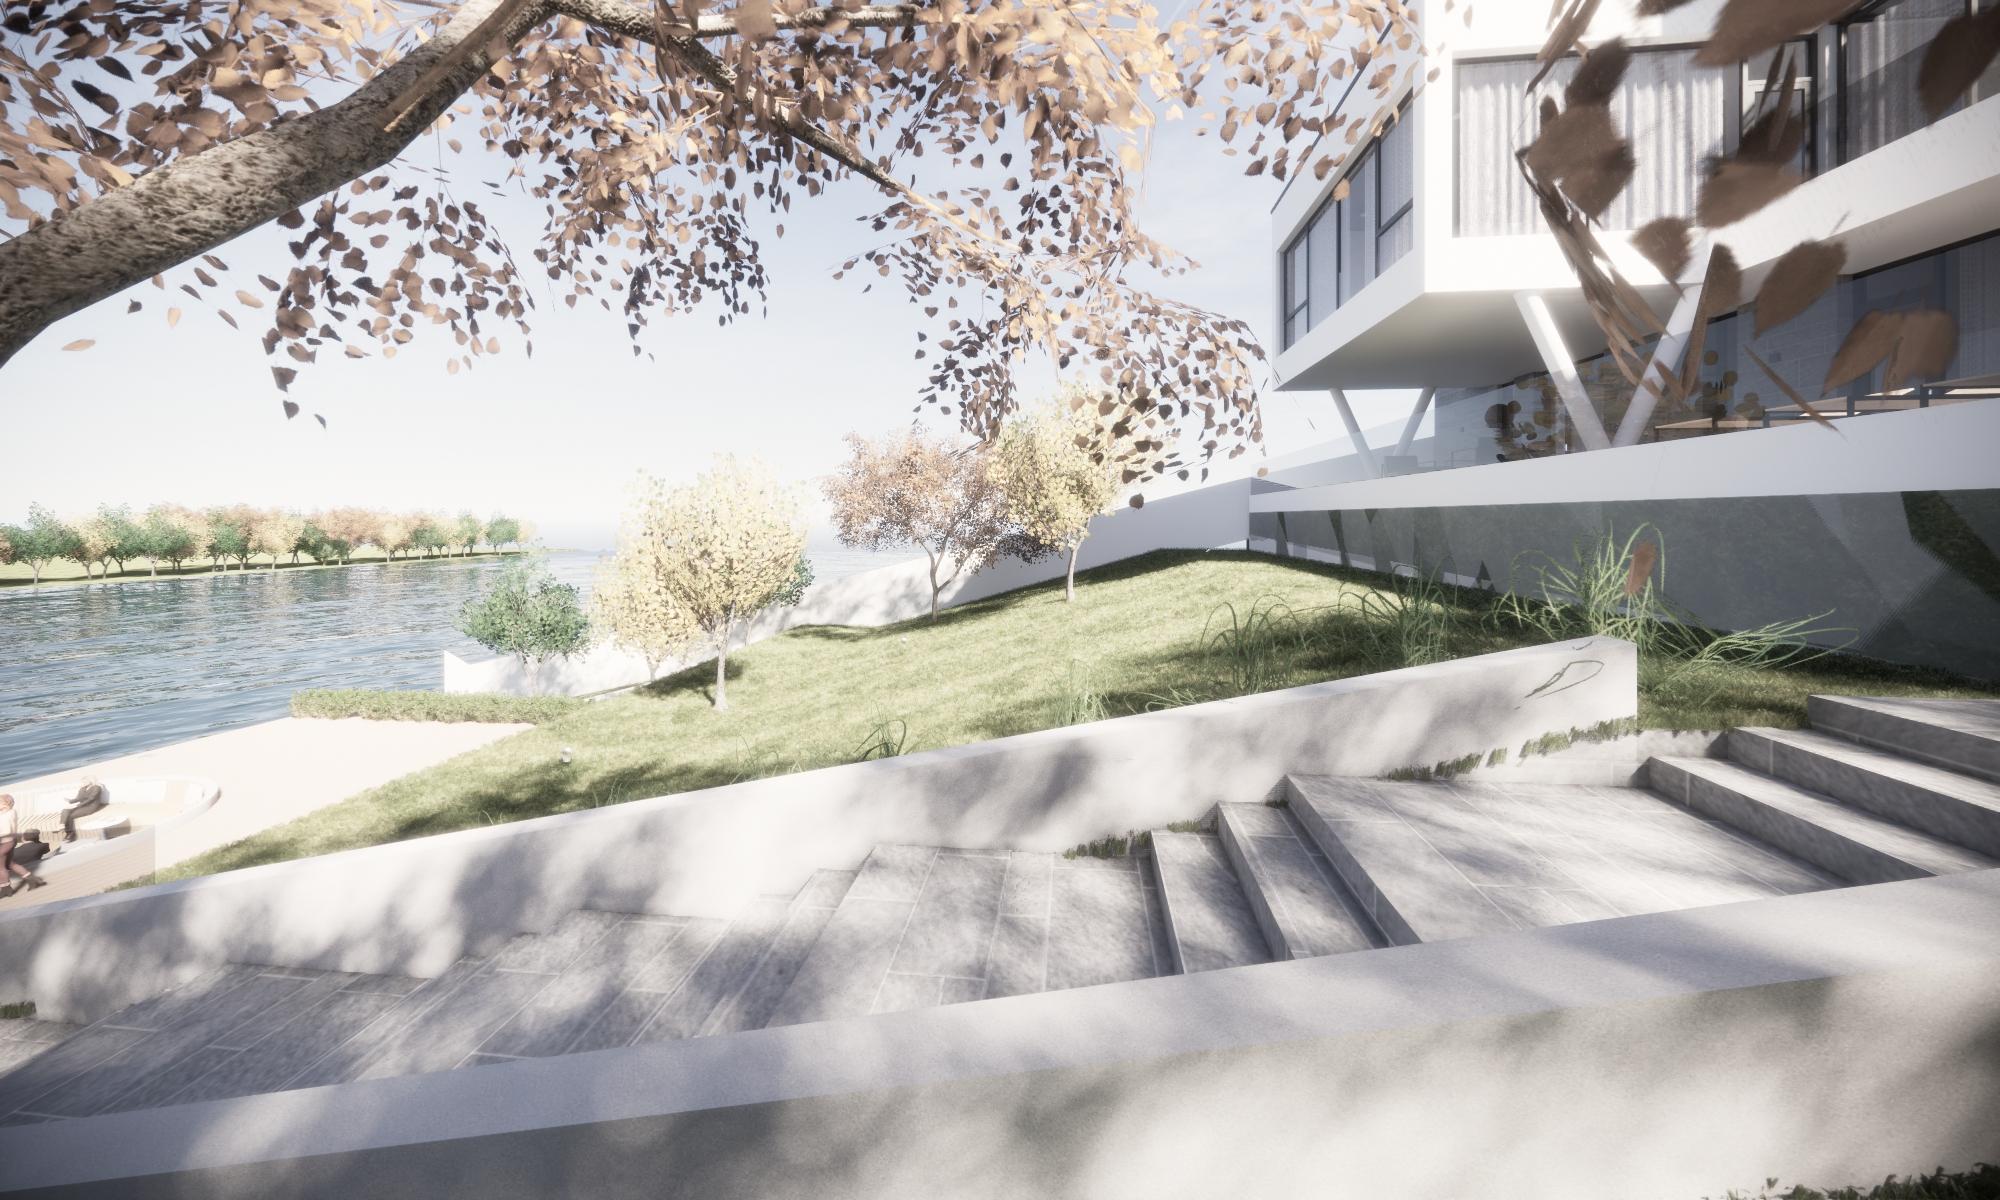 https://nbc-arhitect.ro/wp-content/uploads/2020/11/NBC-Arhitect-_-residential-_-2x-Snagov-_-Snagov-Romania_29.jpg